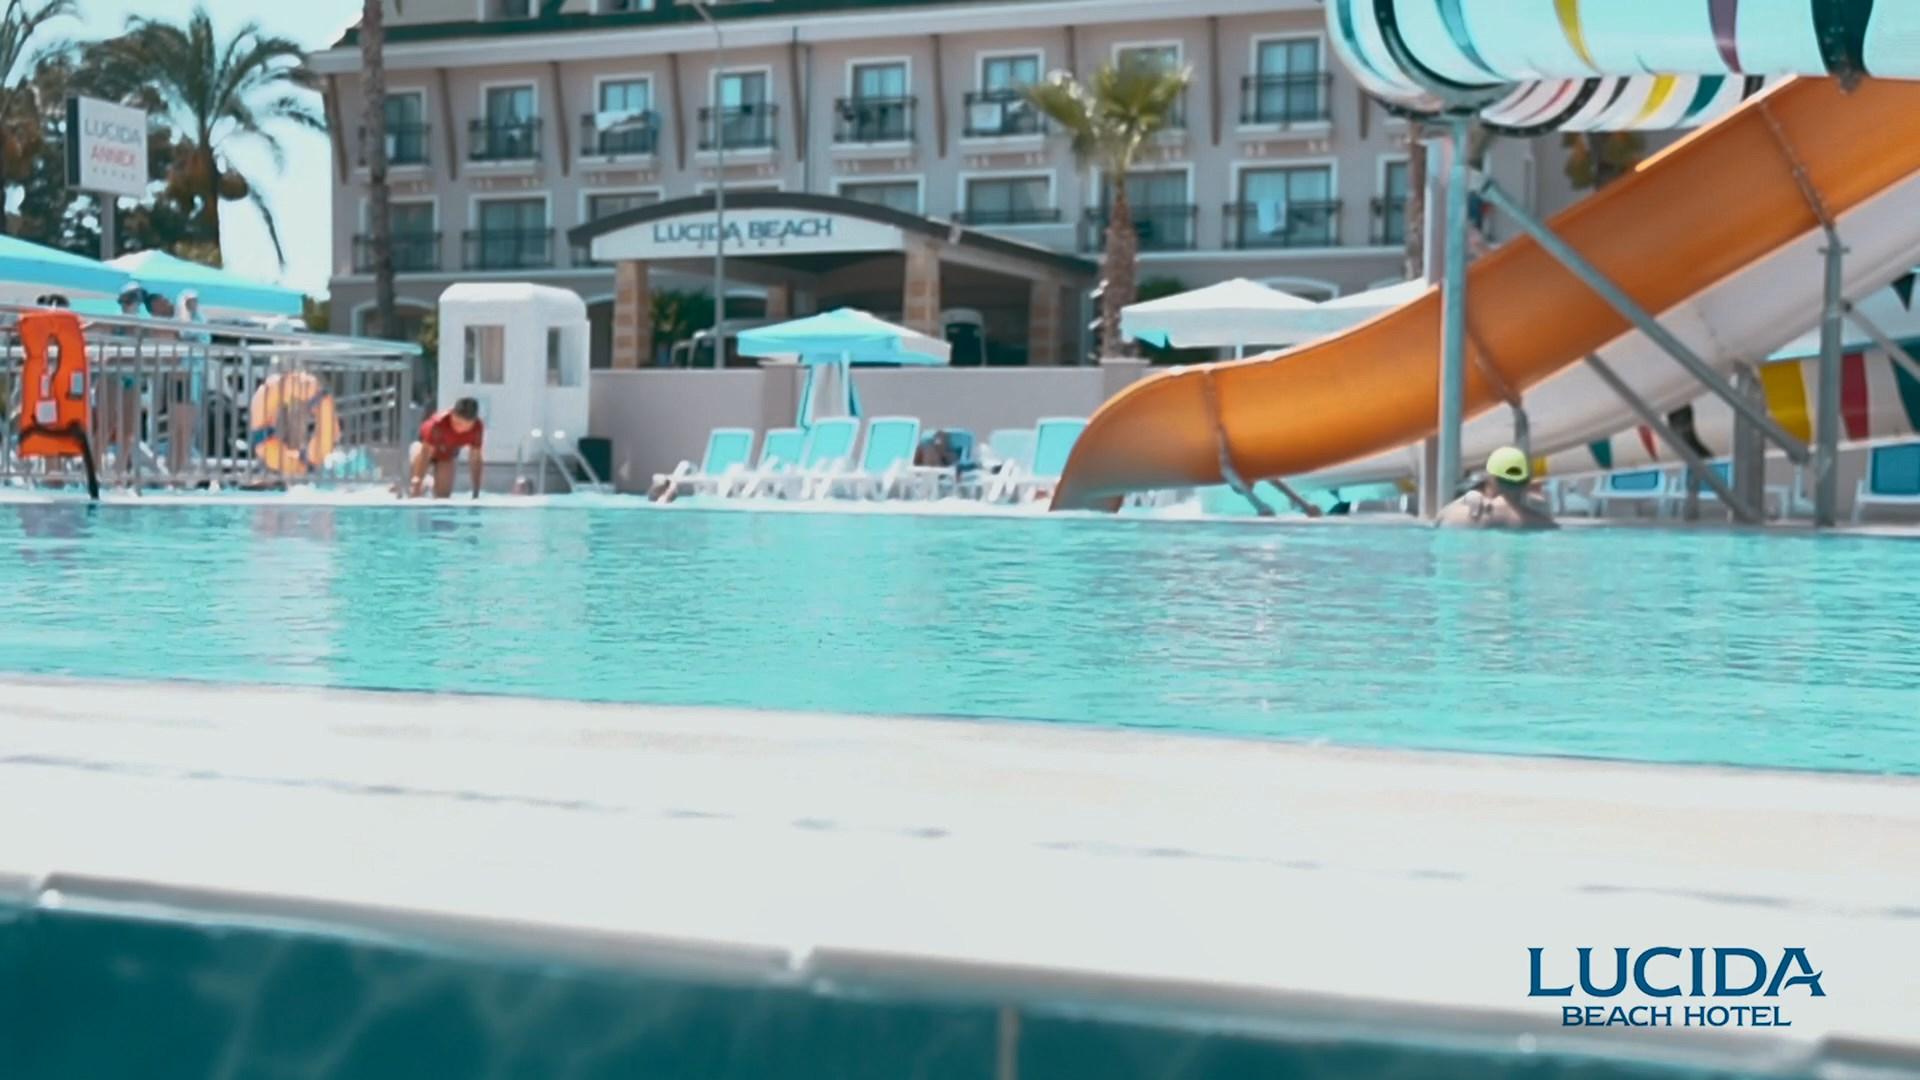 LUCIDA BEACH HOTEL